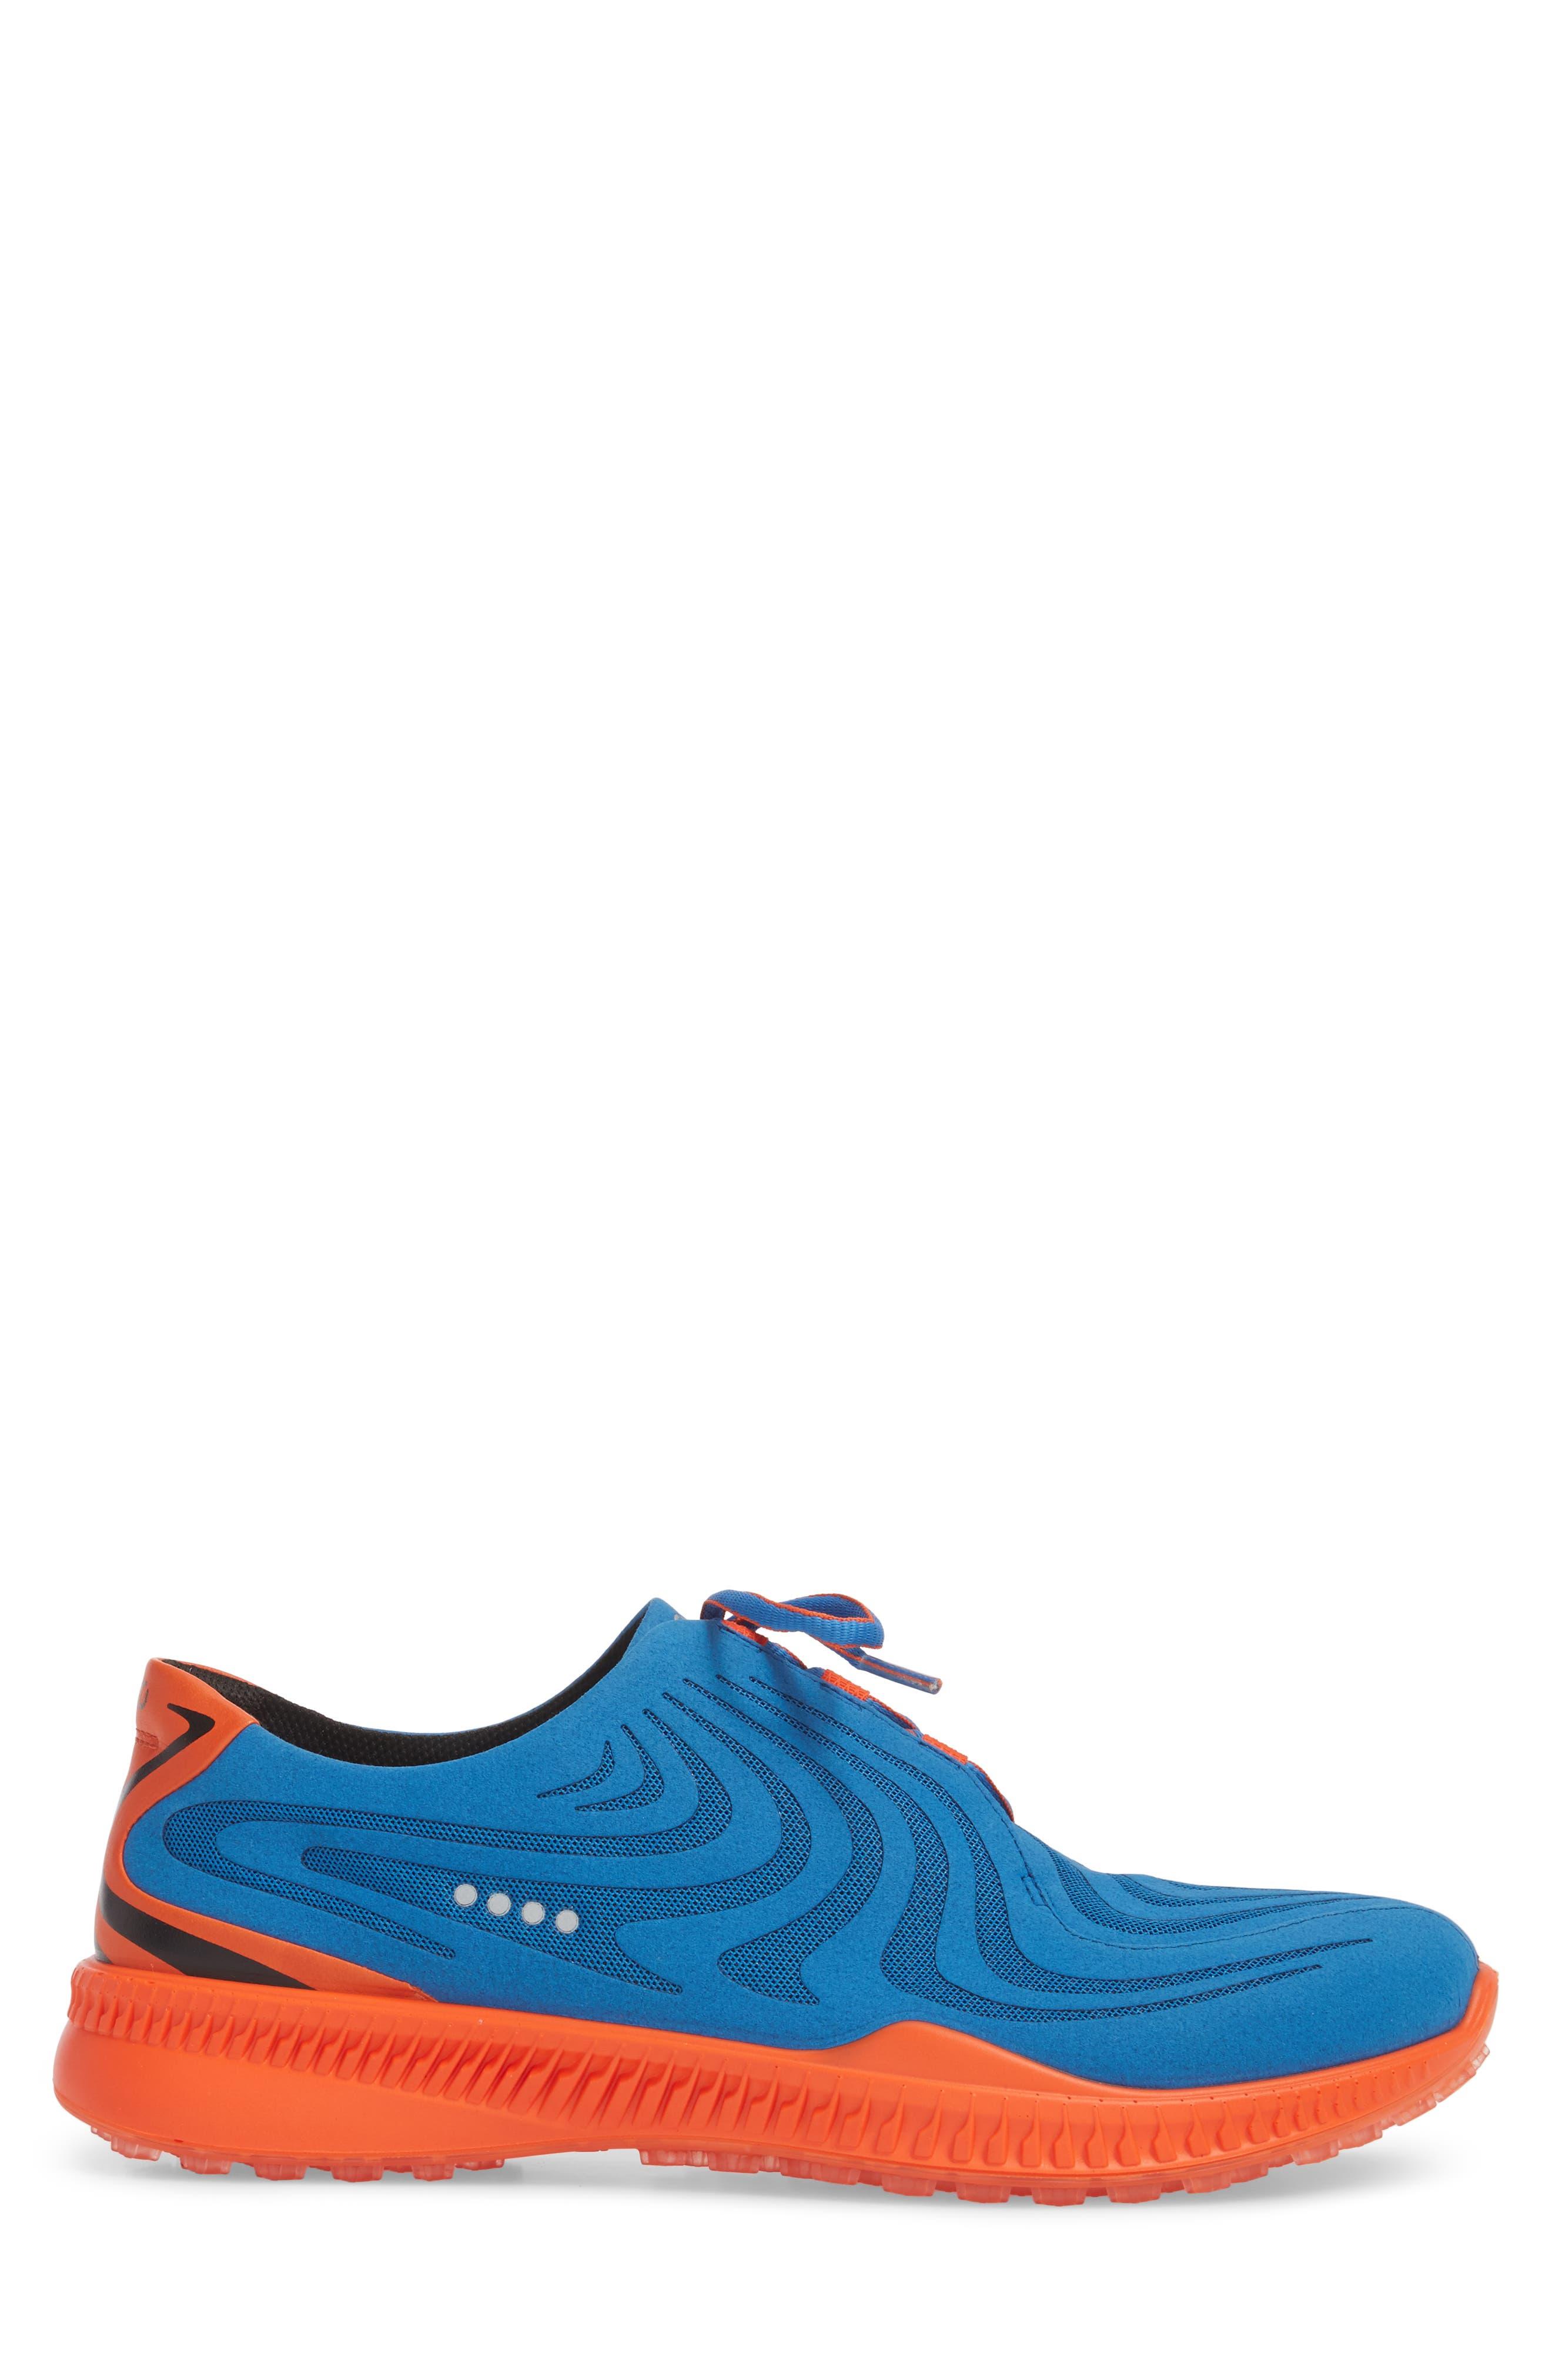 Golf S-Drive Water Resistant Shoe,                             Alternate thumbnail 3, color,                             Bermuda Blue Leather